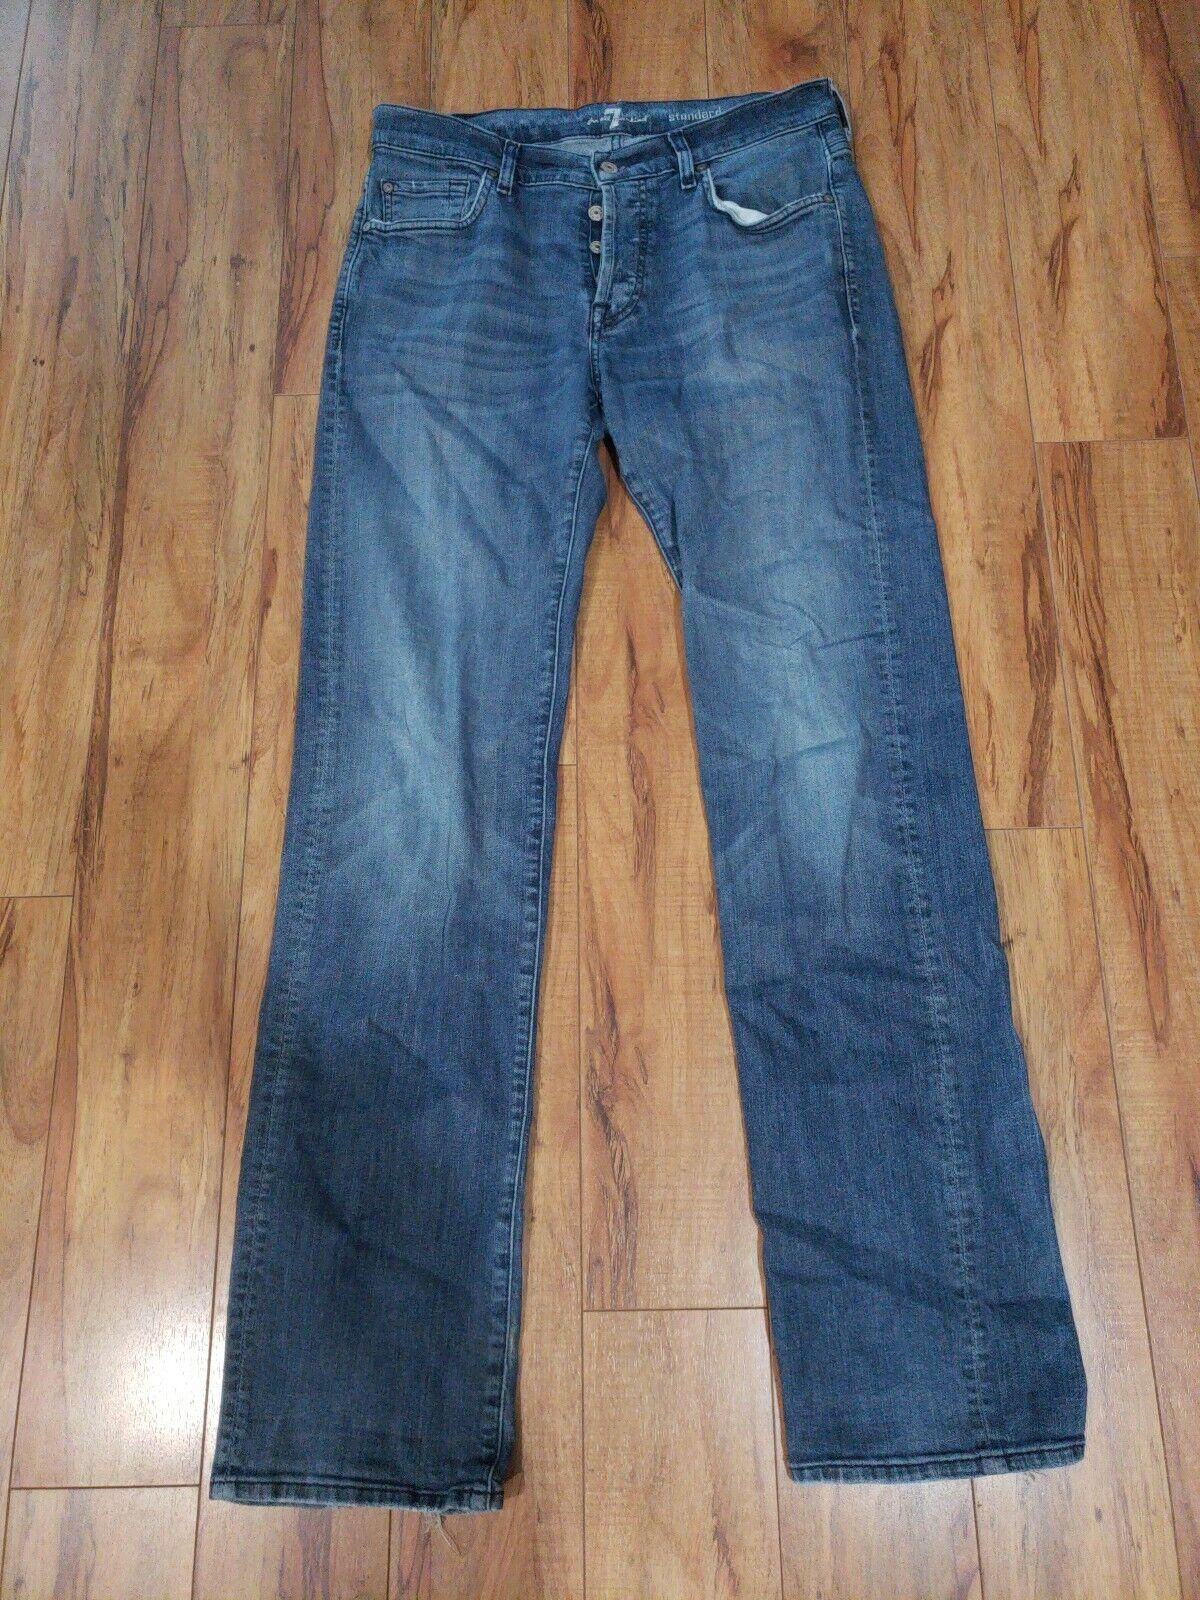 7 For All Mankind Standard Denim Jeans Men Size 32 x 34